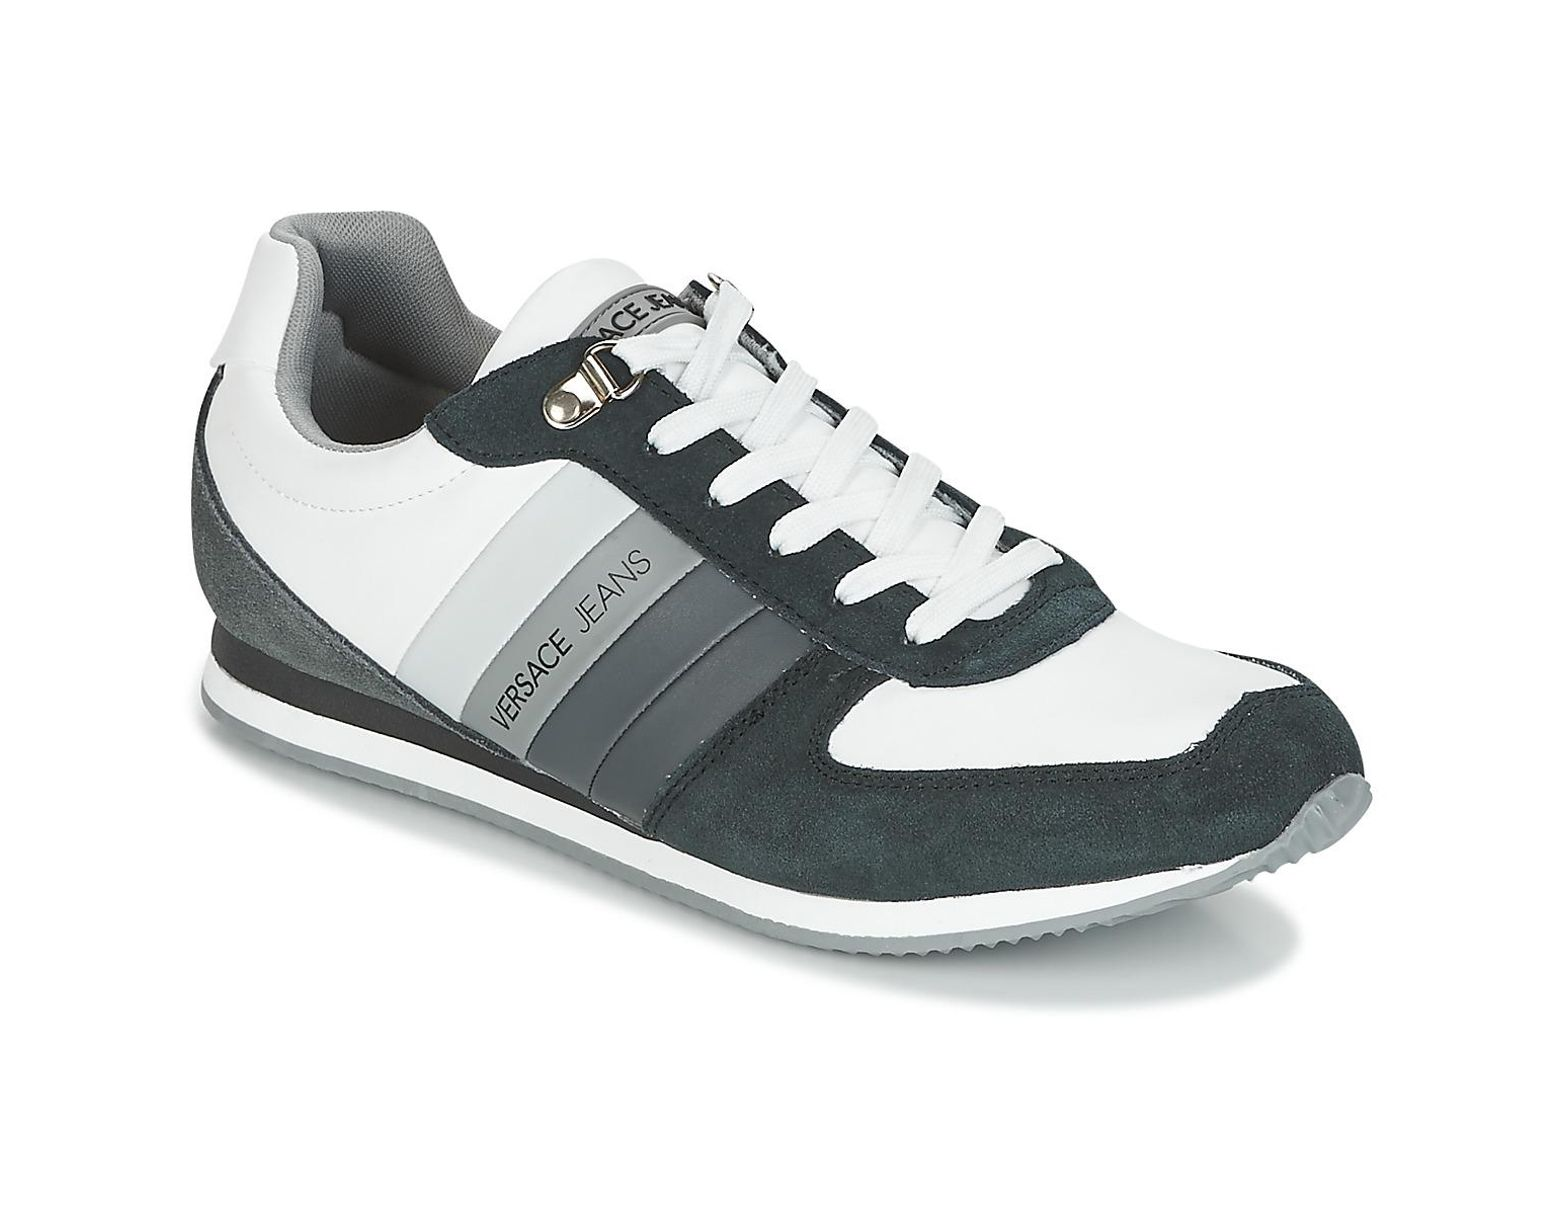 Hommes En Running Yrbsa1 Chaussures Blanc 6IfgY7byvm